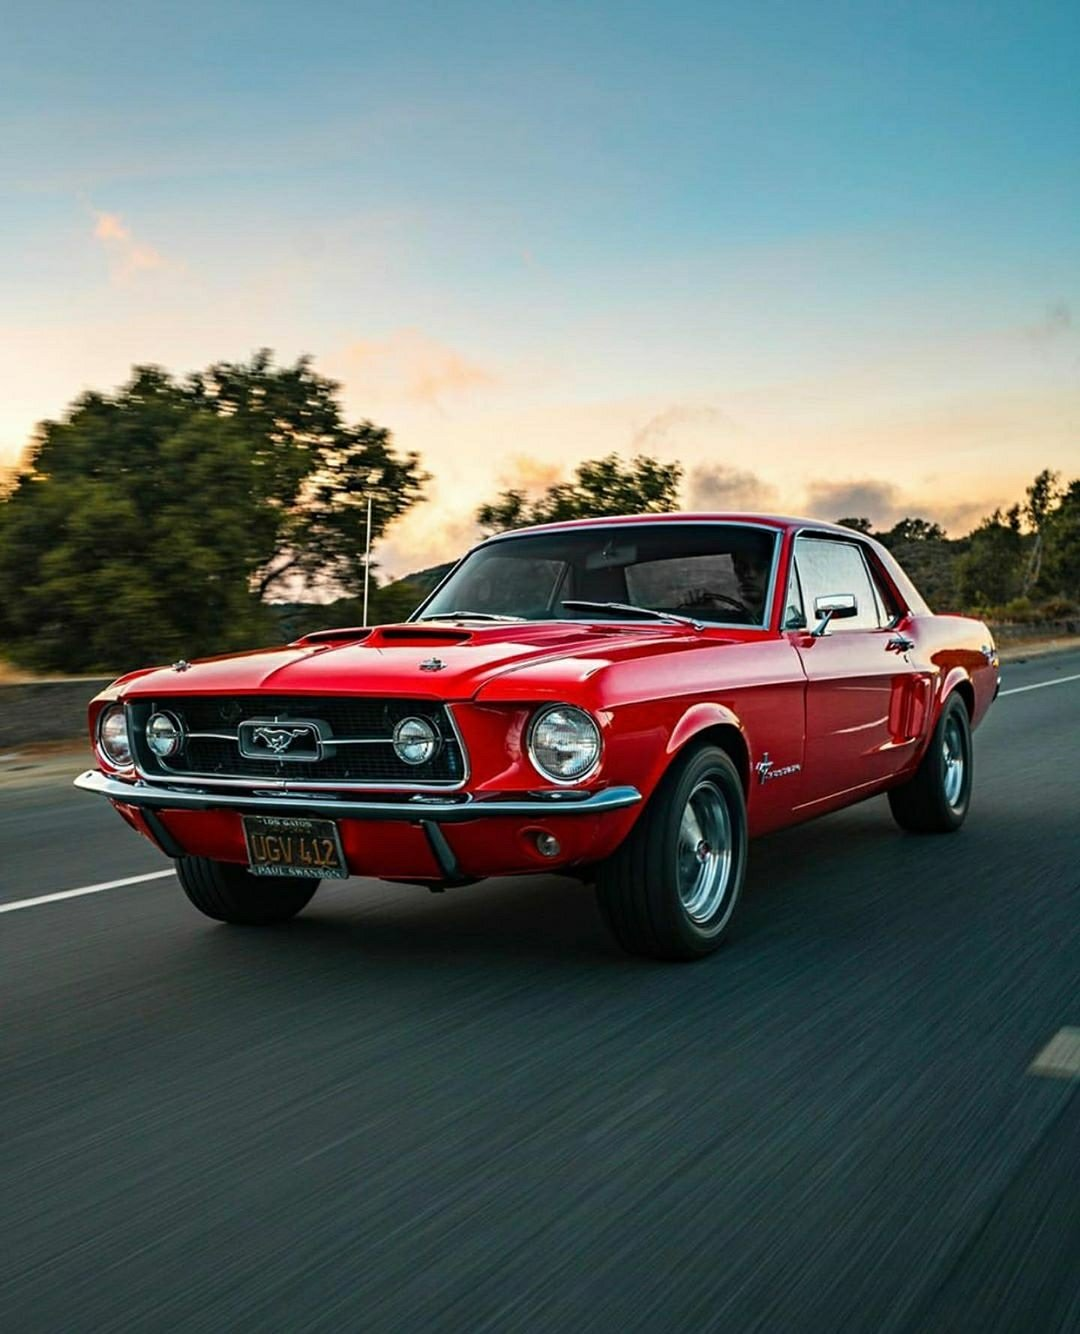 Red 1968 Mustang